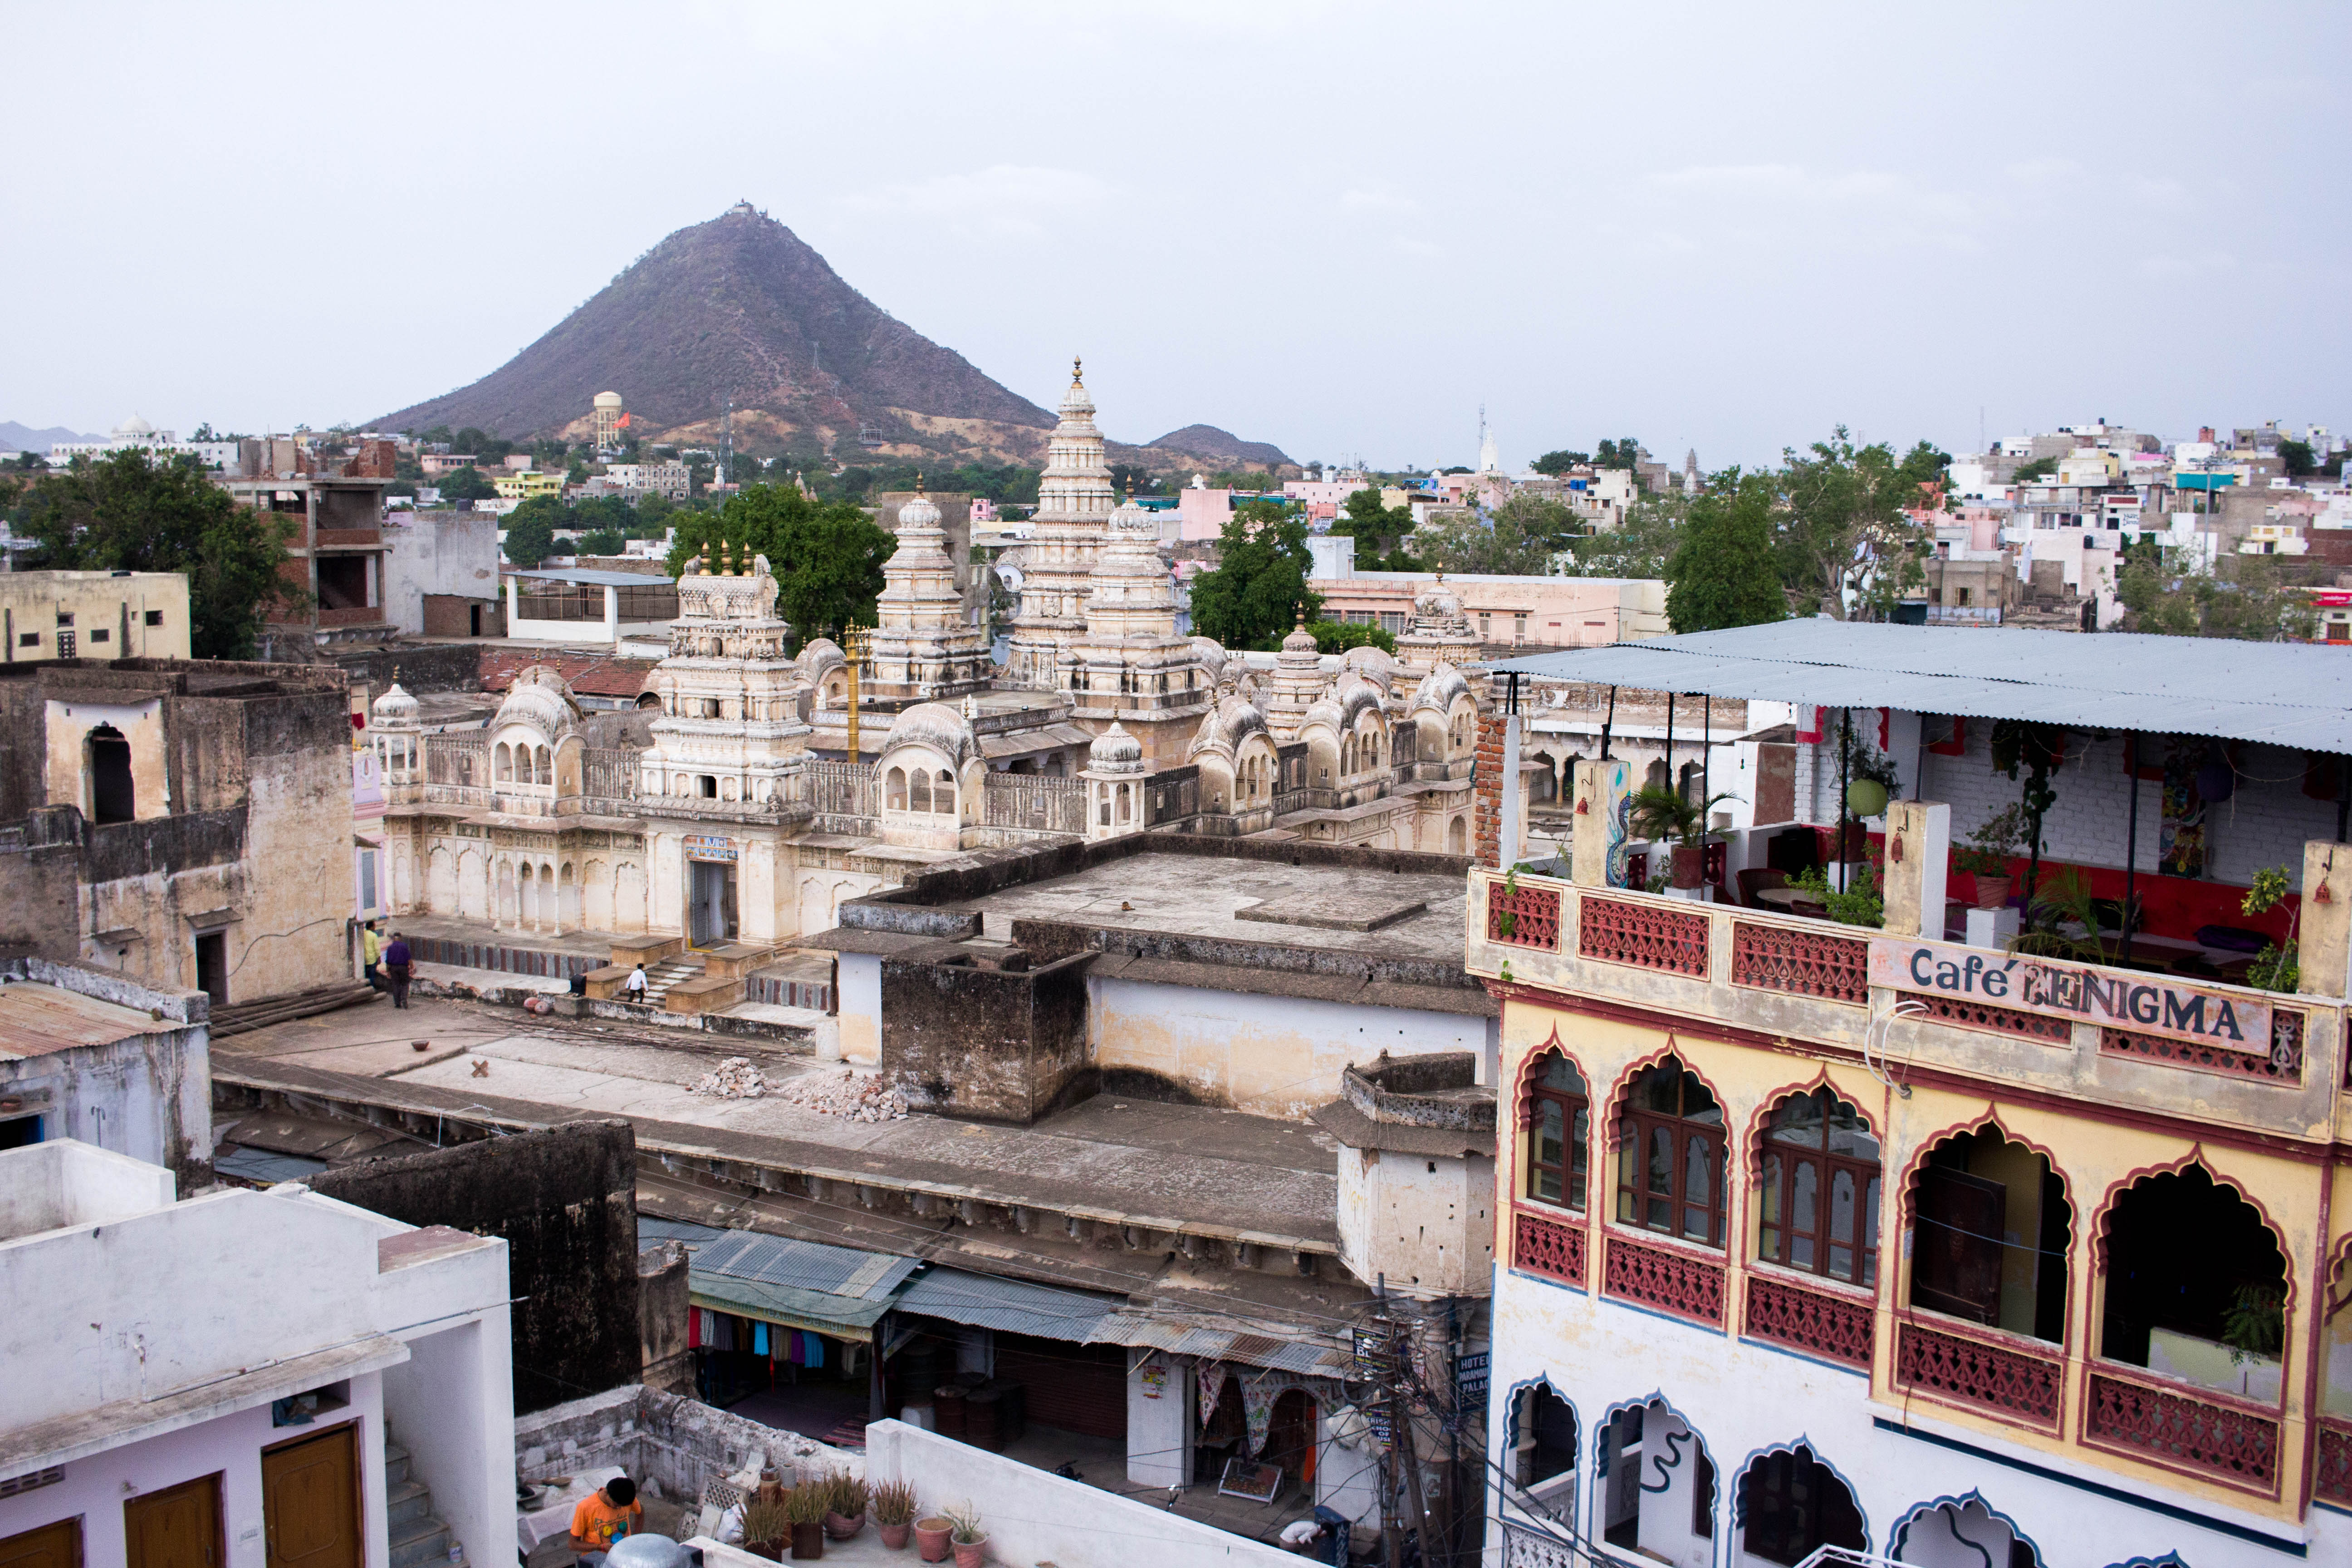 Reasons to put Pushkar on your India bucket list - Kathi Kamleitner - Travelettes (7 of 83)